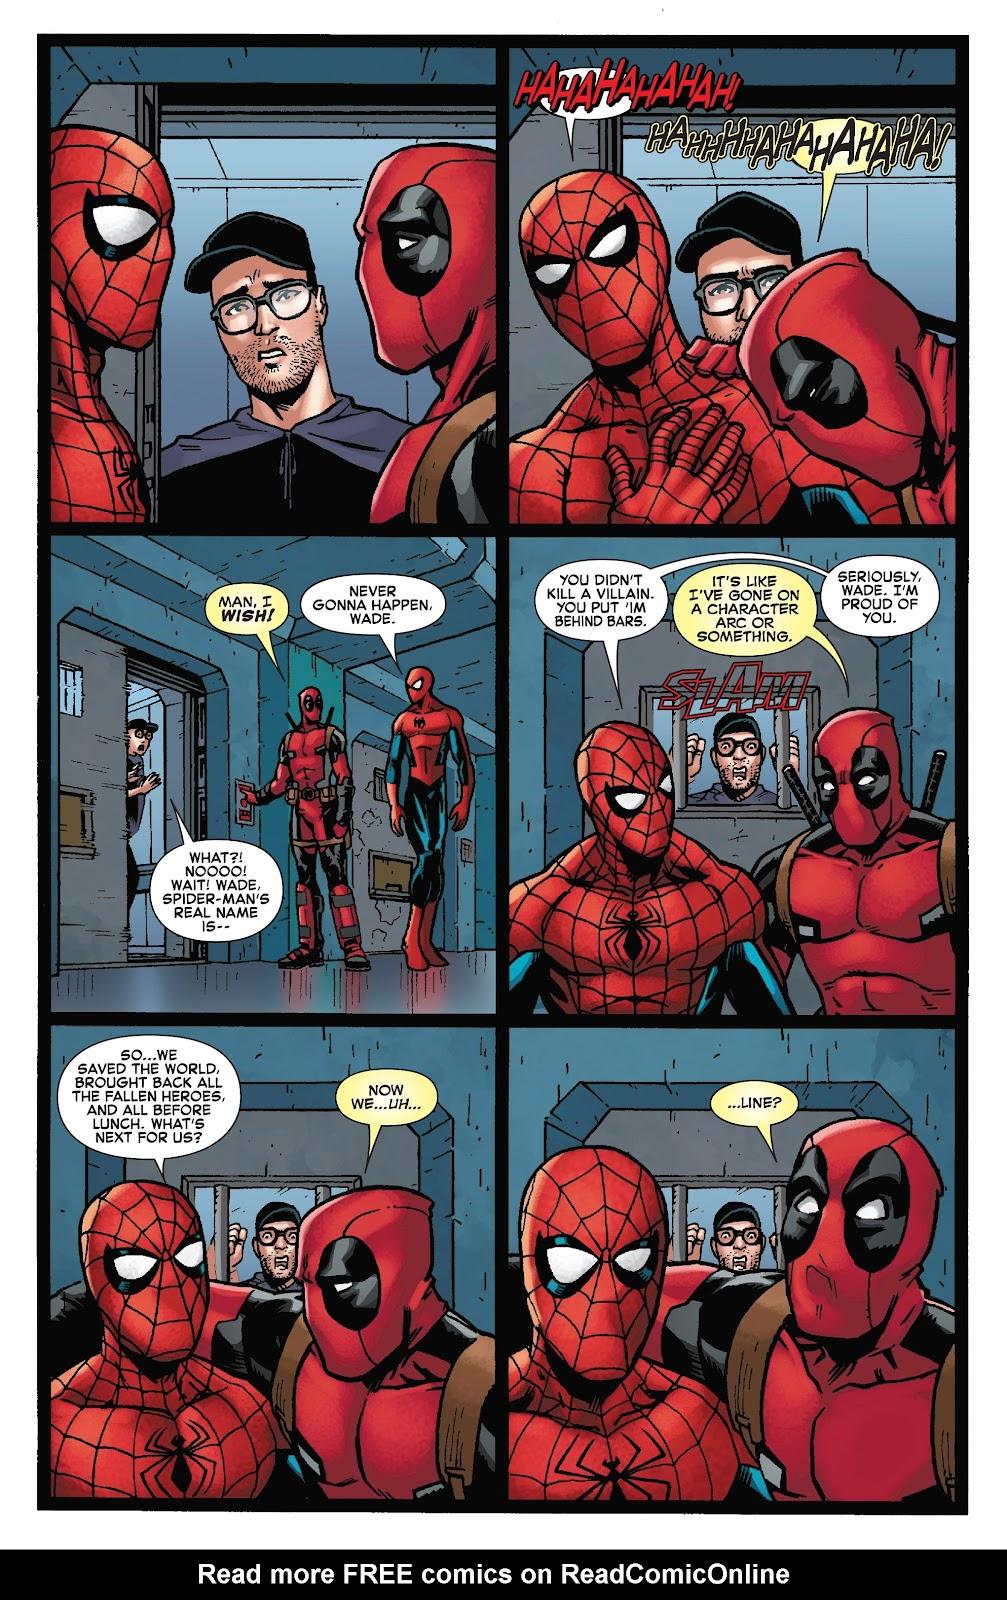 Read online Spider-Man/Deadpool comic -  Issue #50 - 27